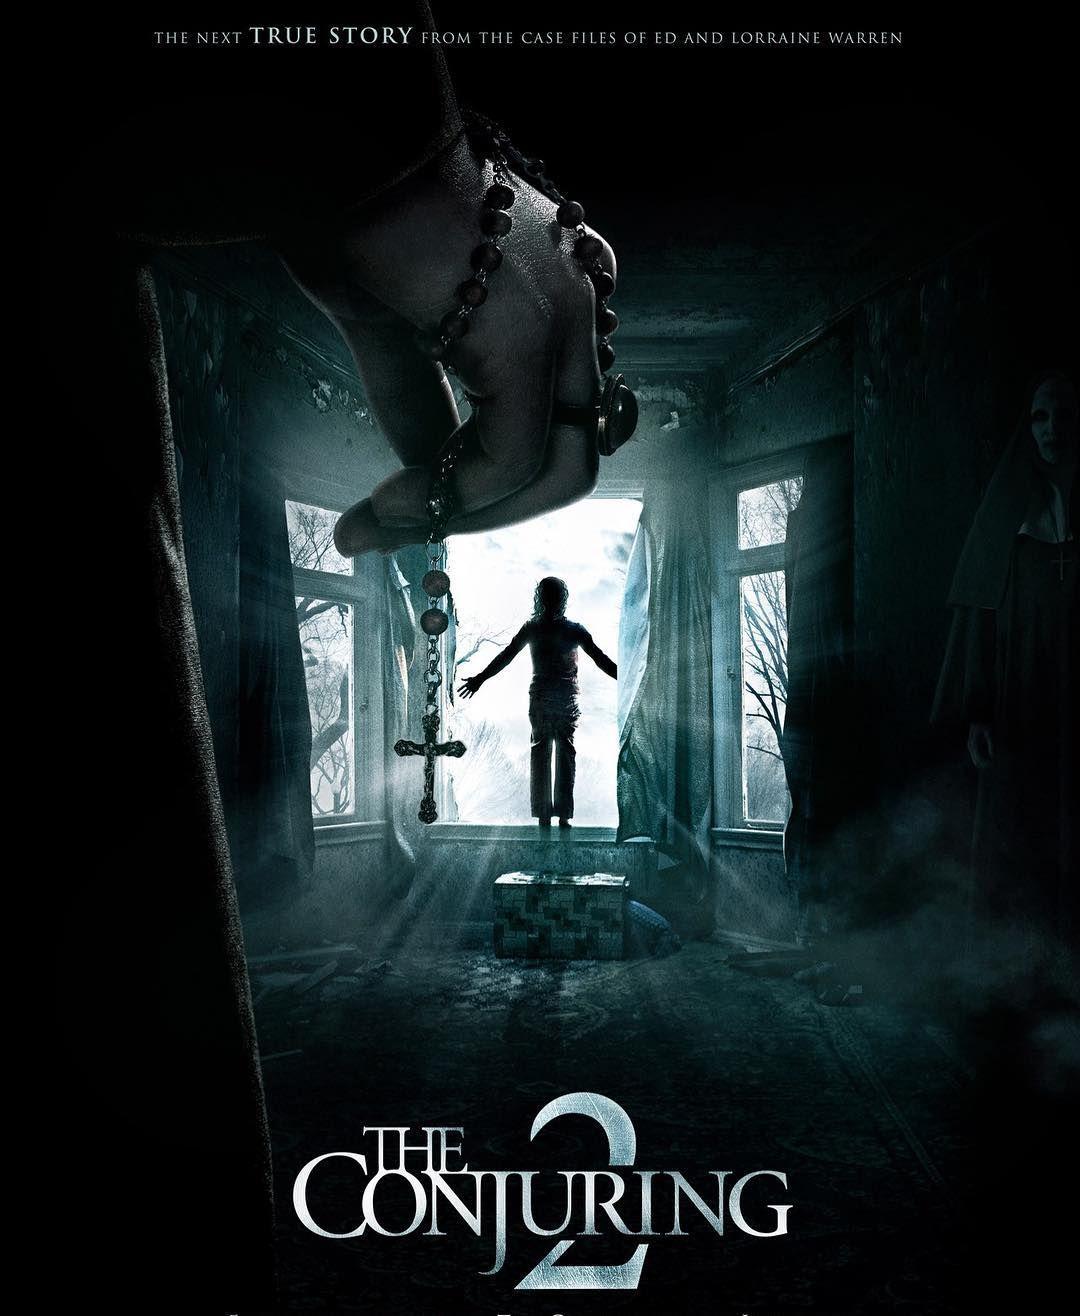 Filmmaker Jameswan The Conjuring 2 2016 Nowwatching Rewatch Halloween Halloweenmovies Theconjur The Conjuring Scary Movies To Watch Best Horror Movies